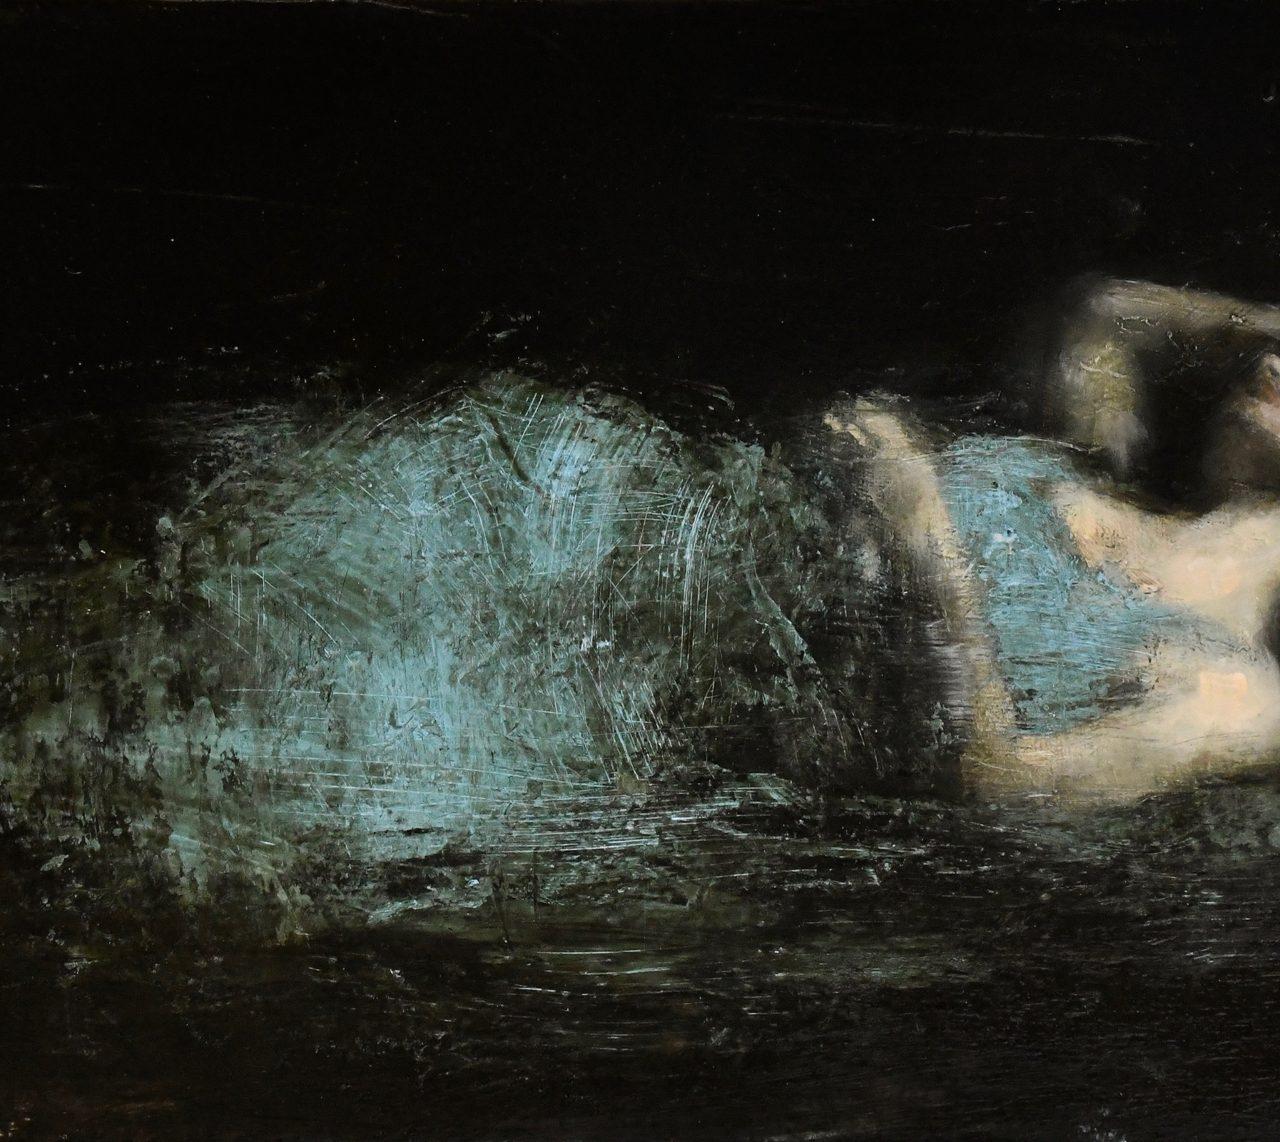 Mark Demsteader's MUSE Show Ignites 'Pre-Raphaelite Renaissance'